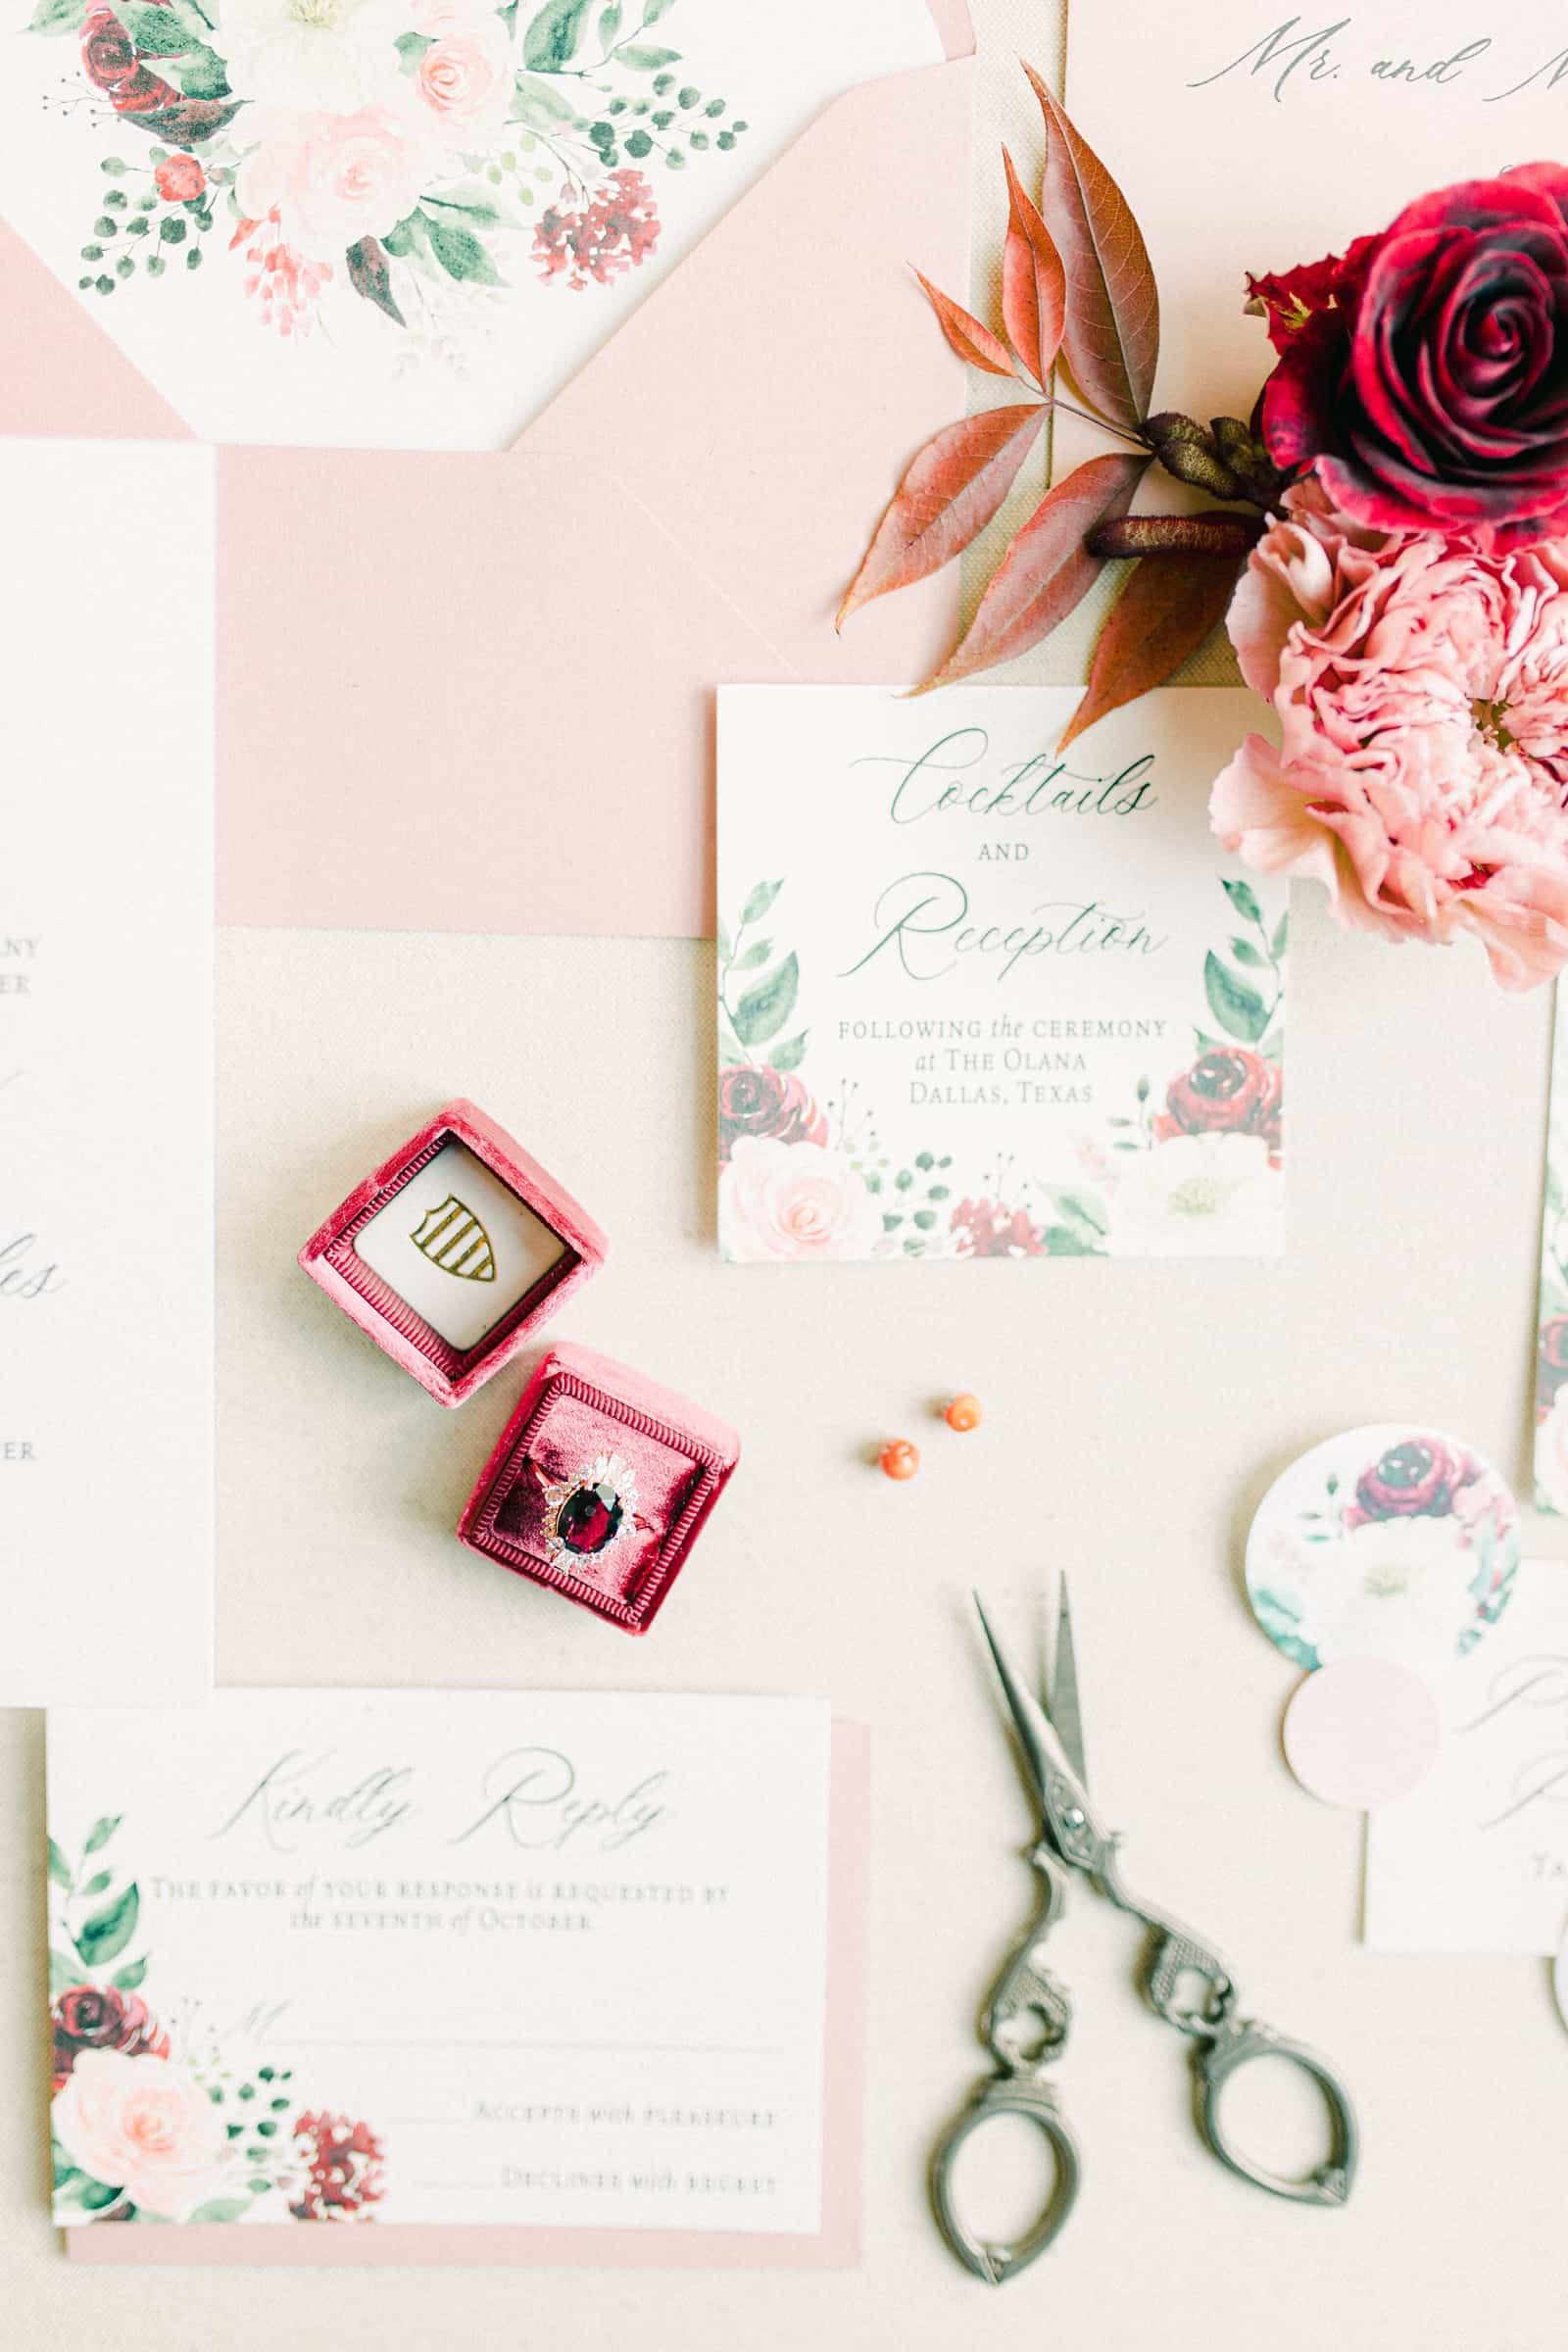 Vintage ruby engagement wedding ring, floral wedding invitations on blush pink background